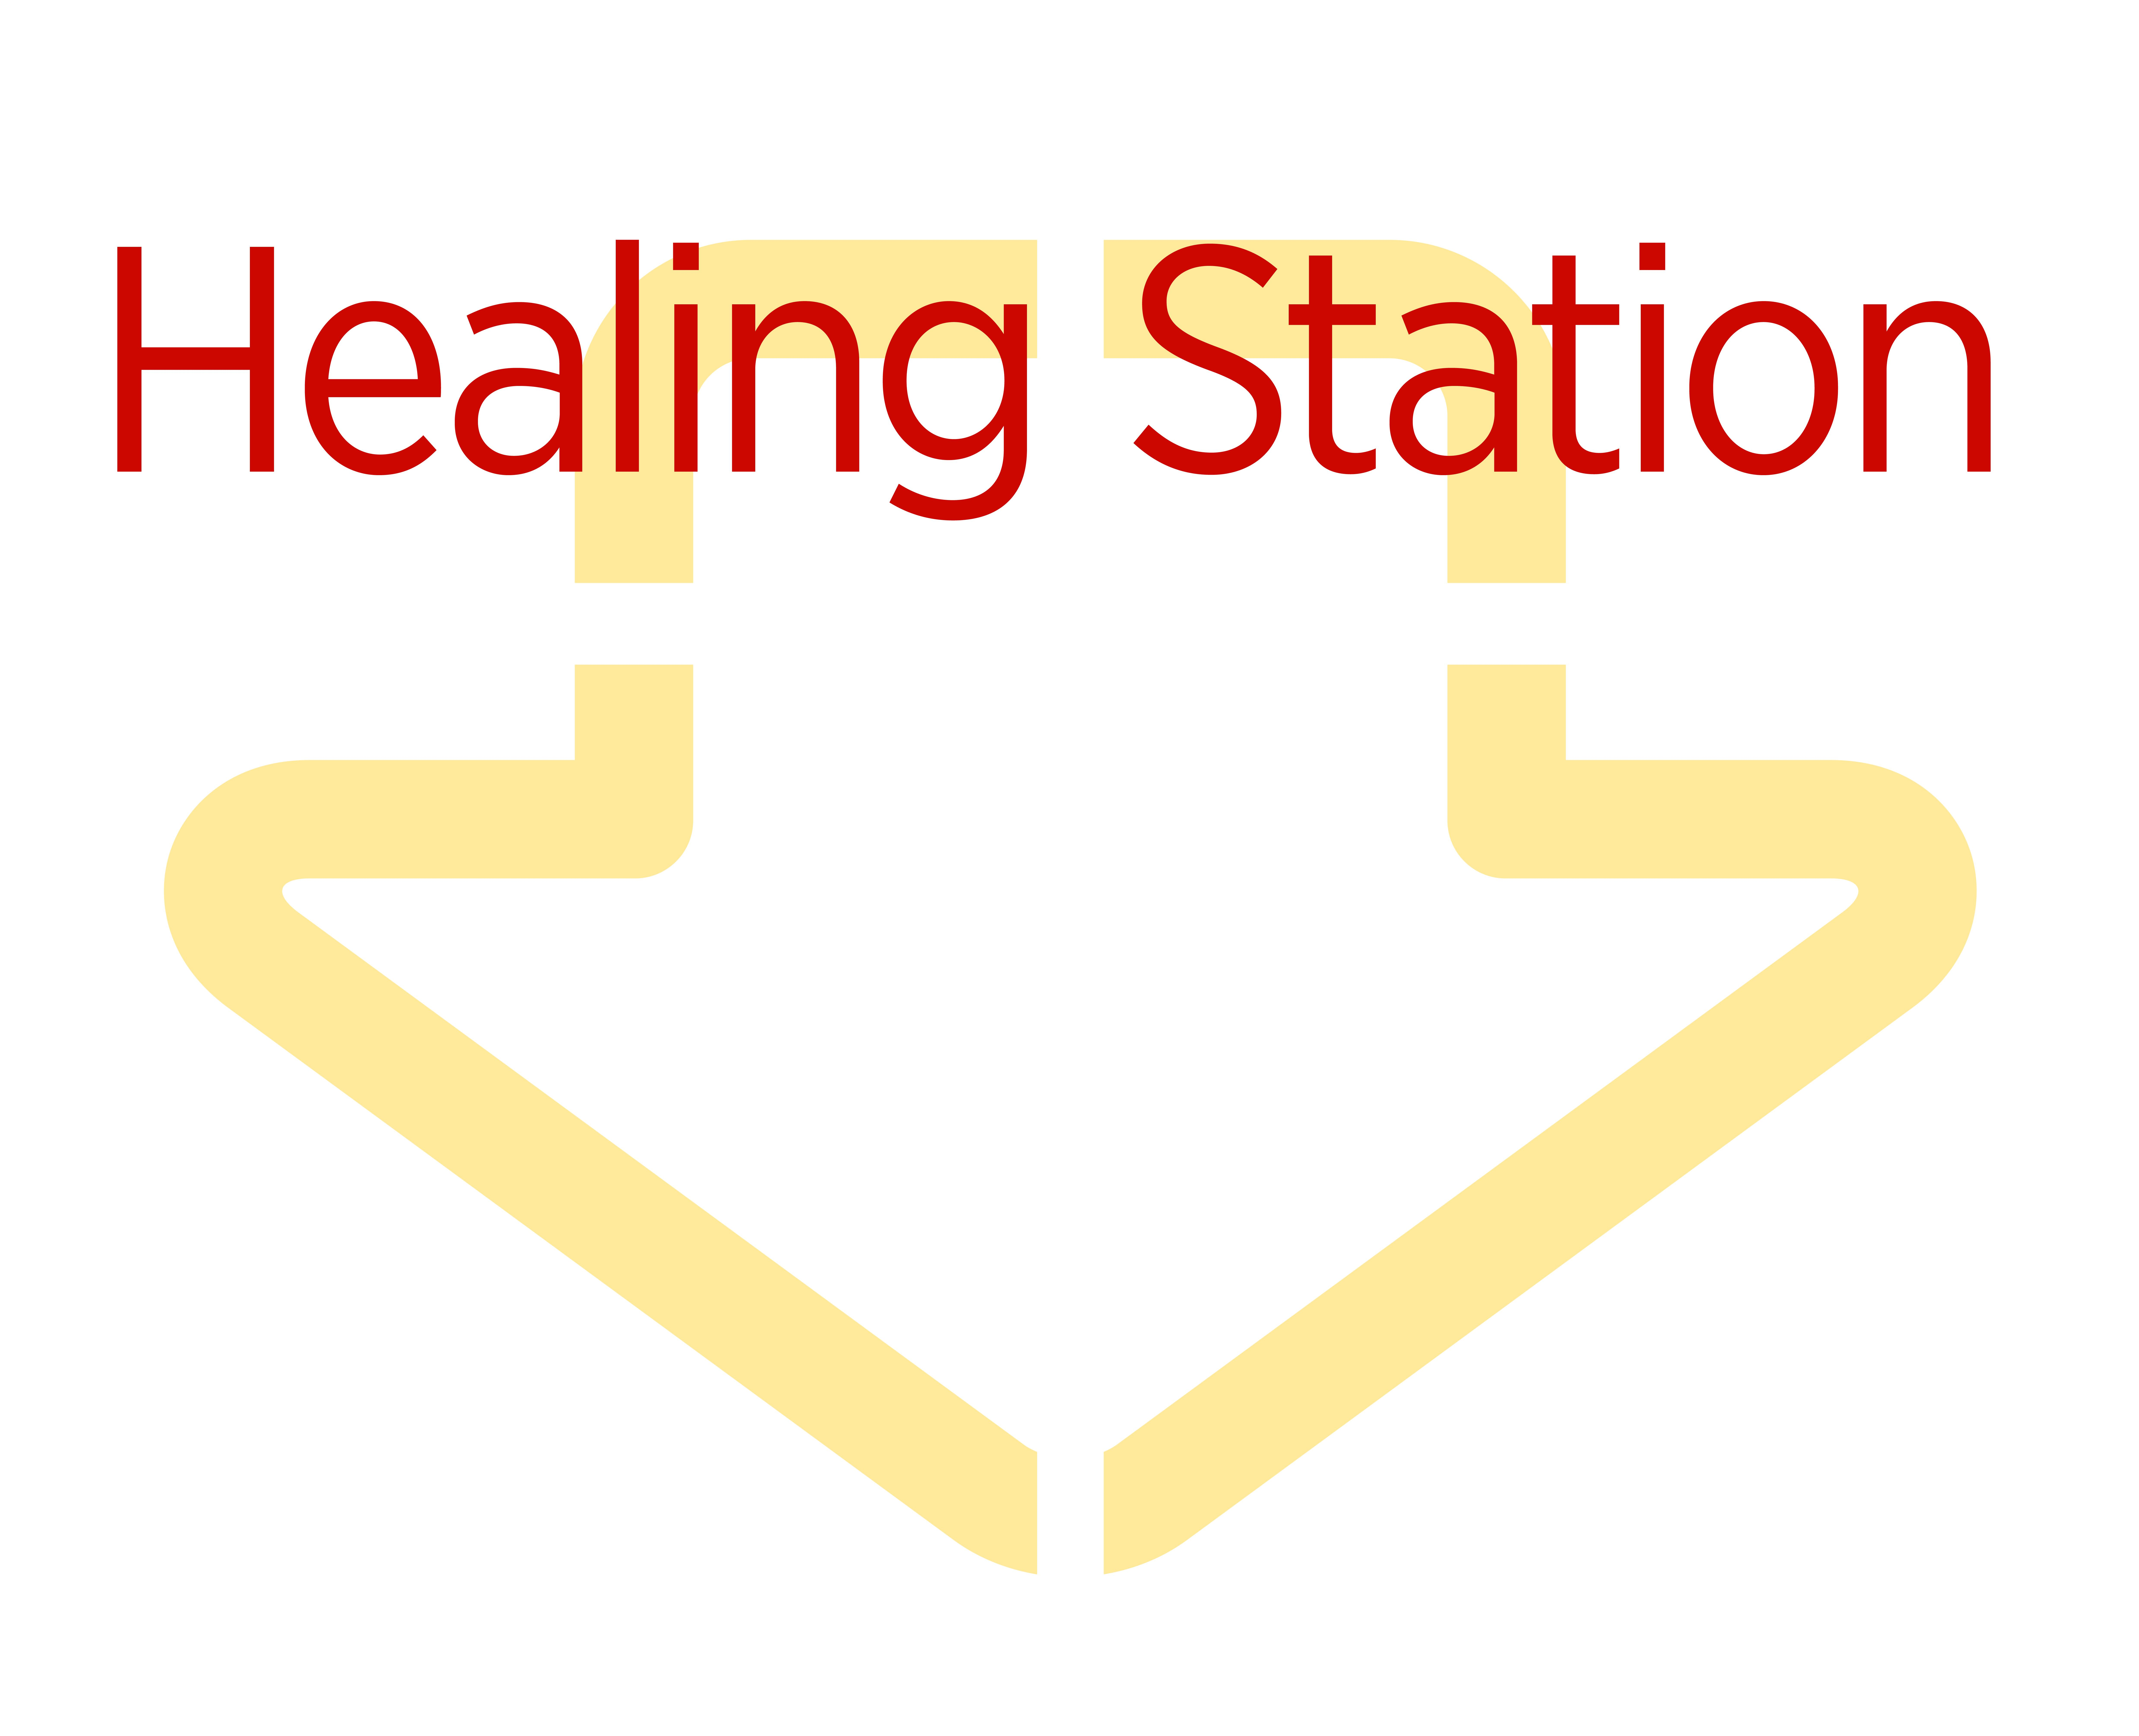 Healingstation